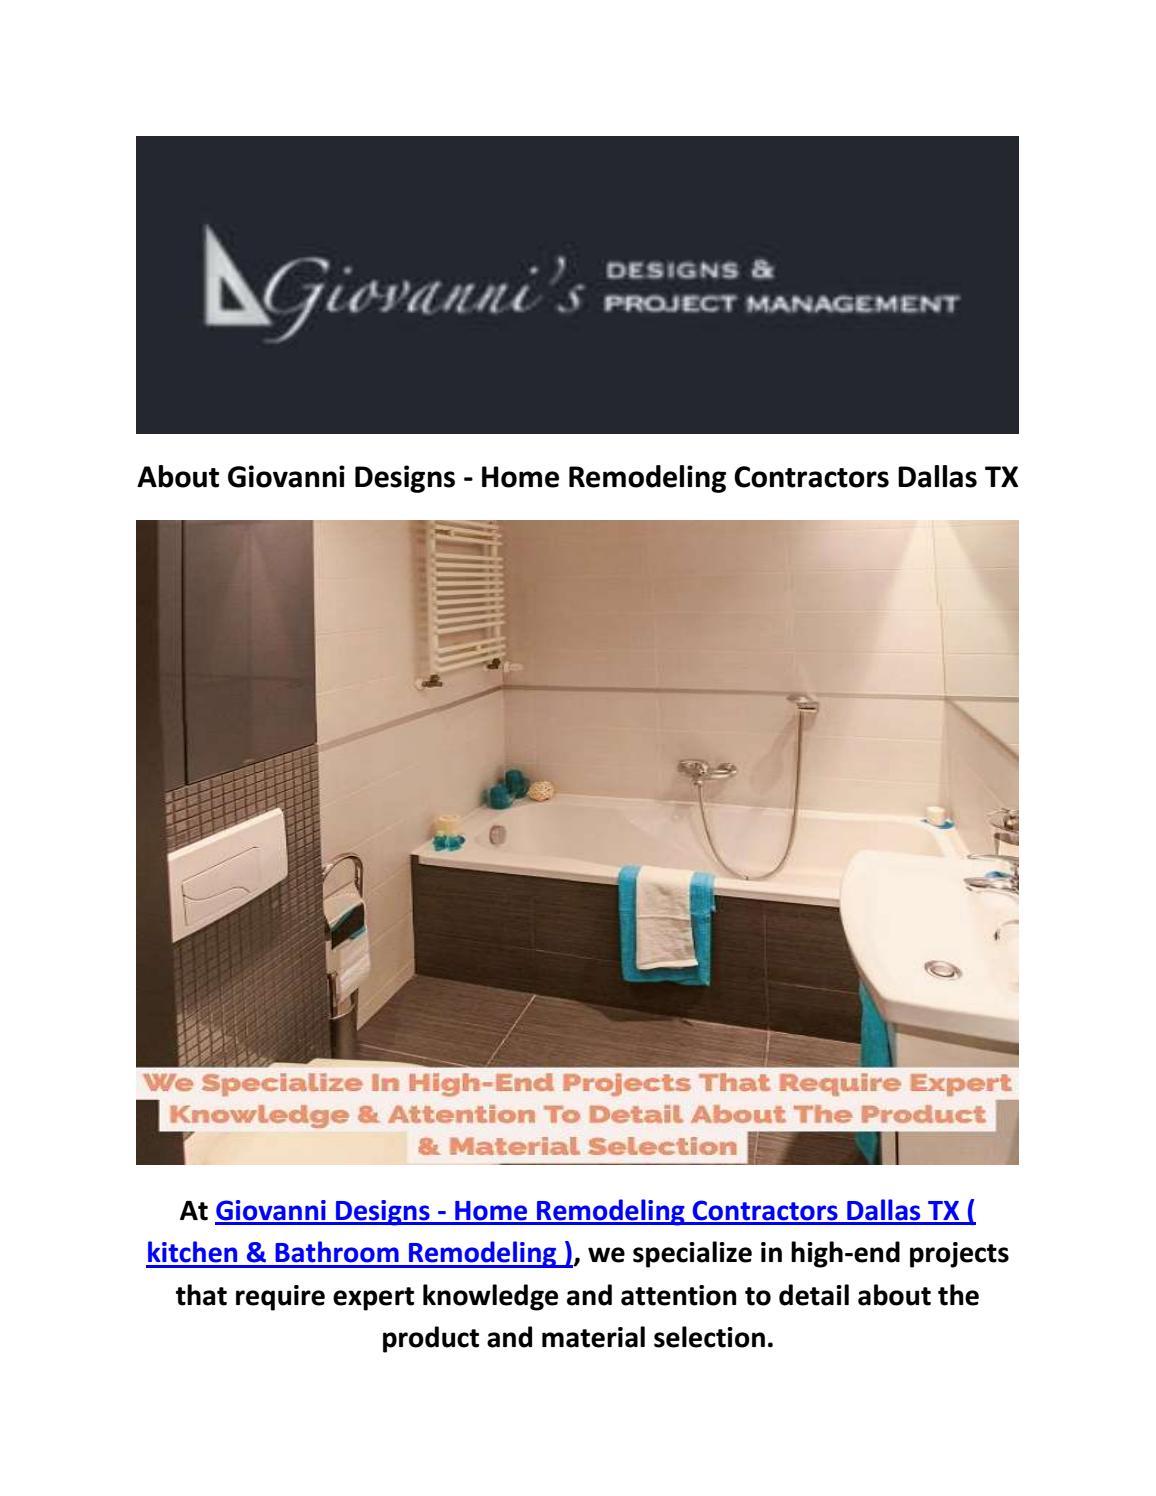 Giovanni Designs Bathroom Remodel In Dallas Tx By Giovanni Designs Home Remodeling Contractors Dallas Tx Kitchen Bathroom Remodeling Issuu